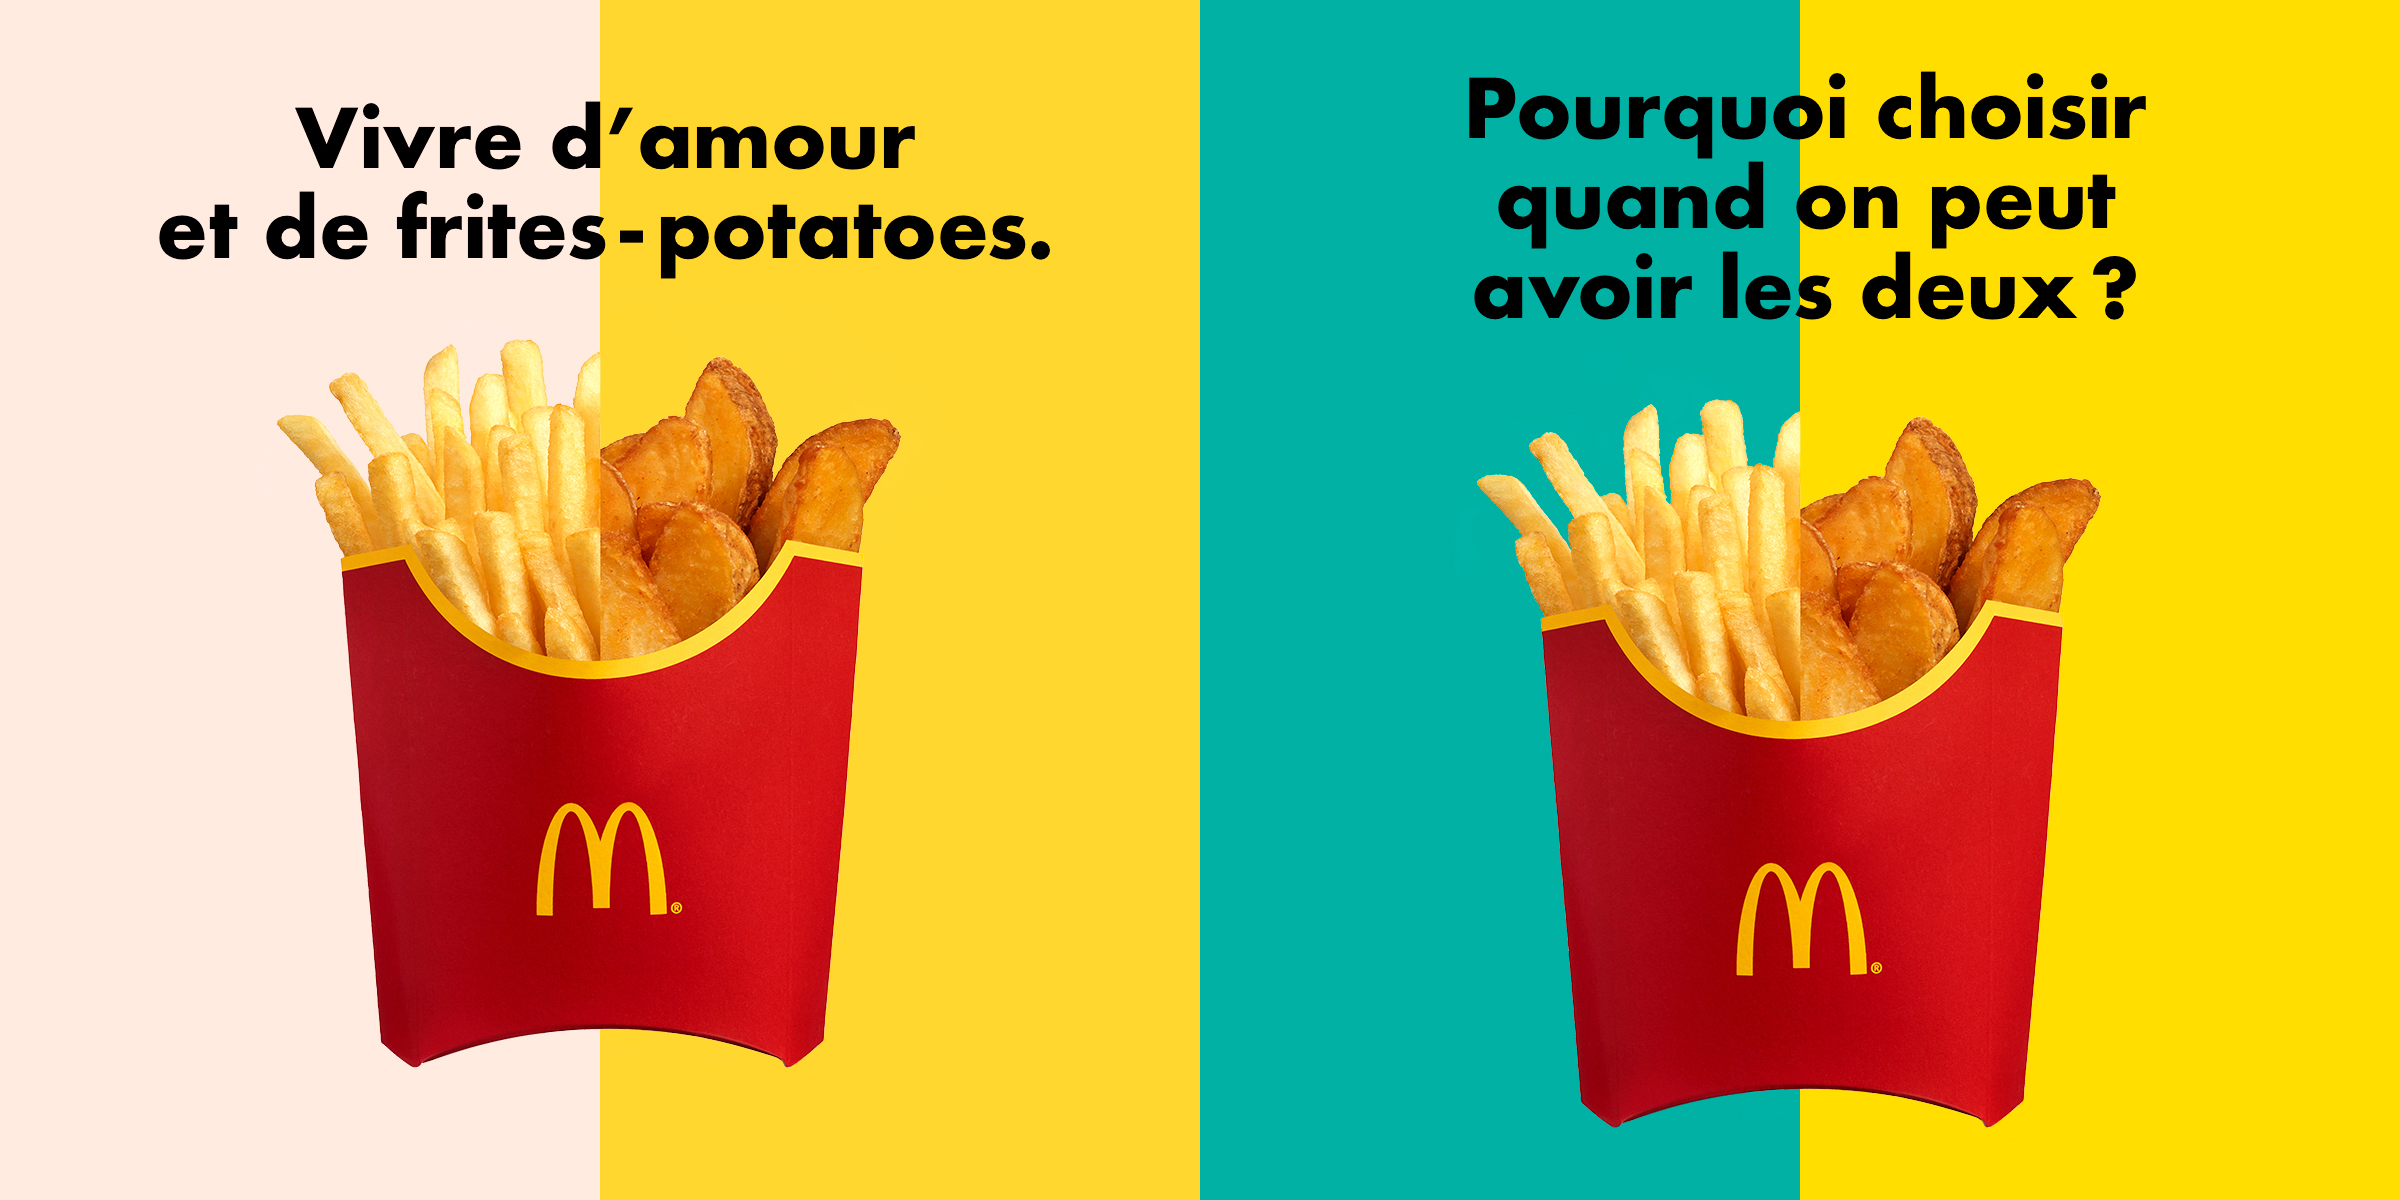 mcdonalds_frites_potatoes